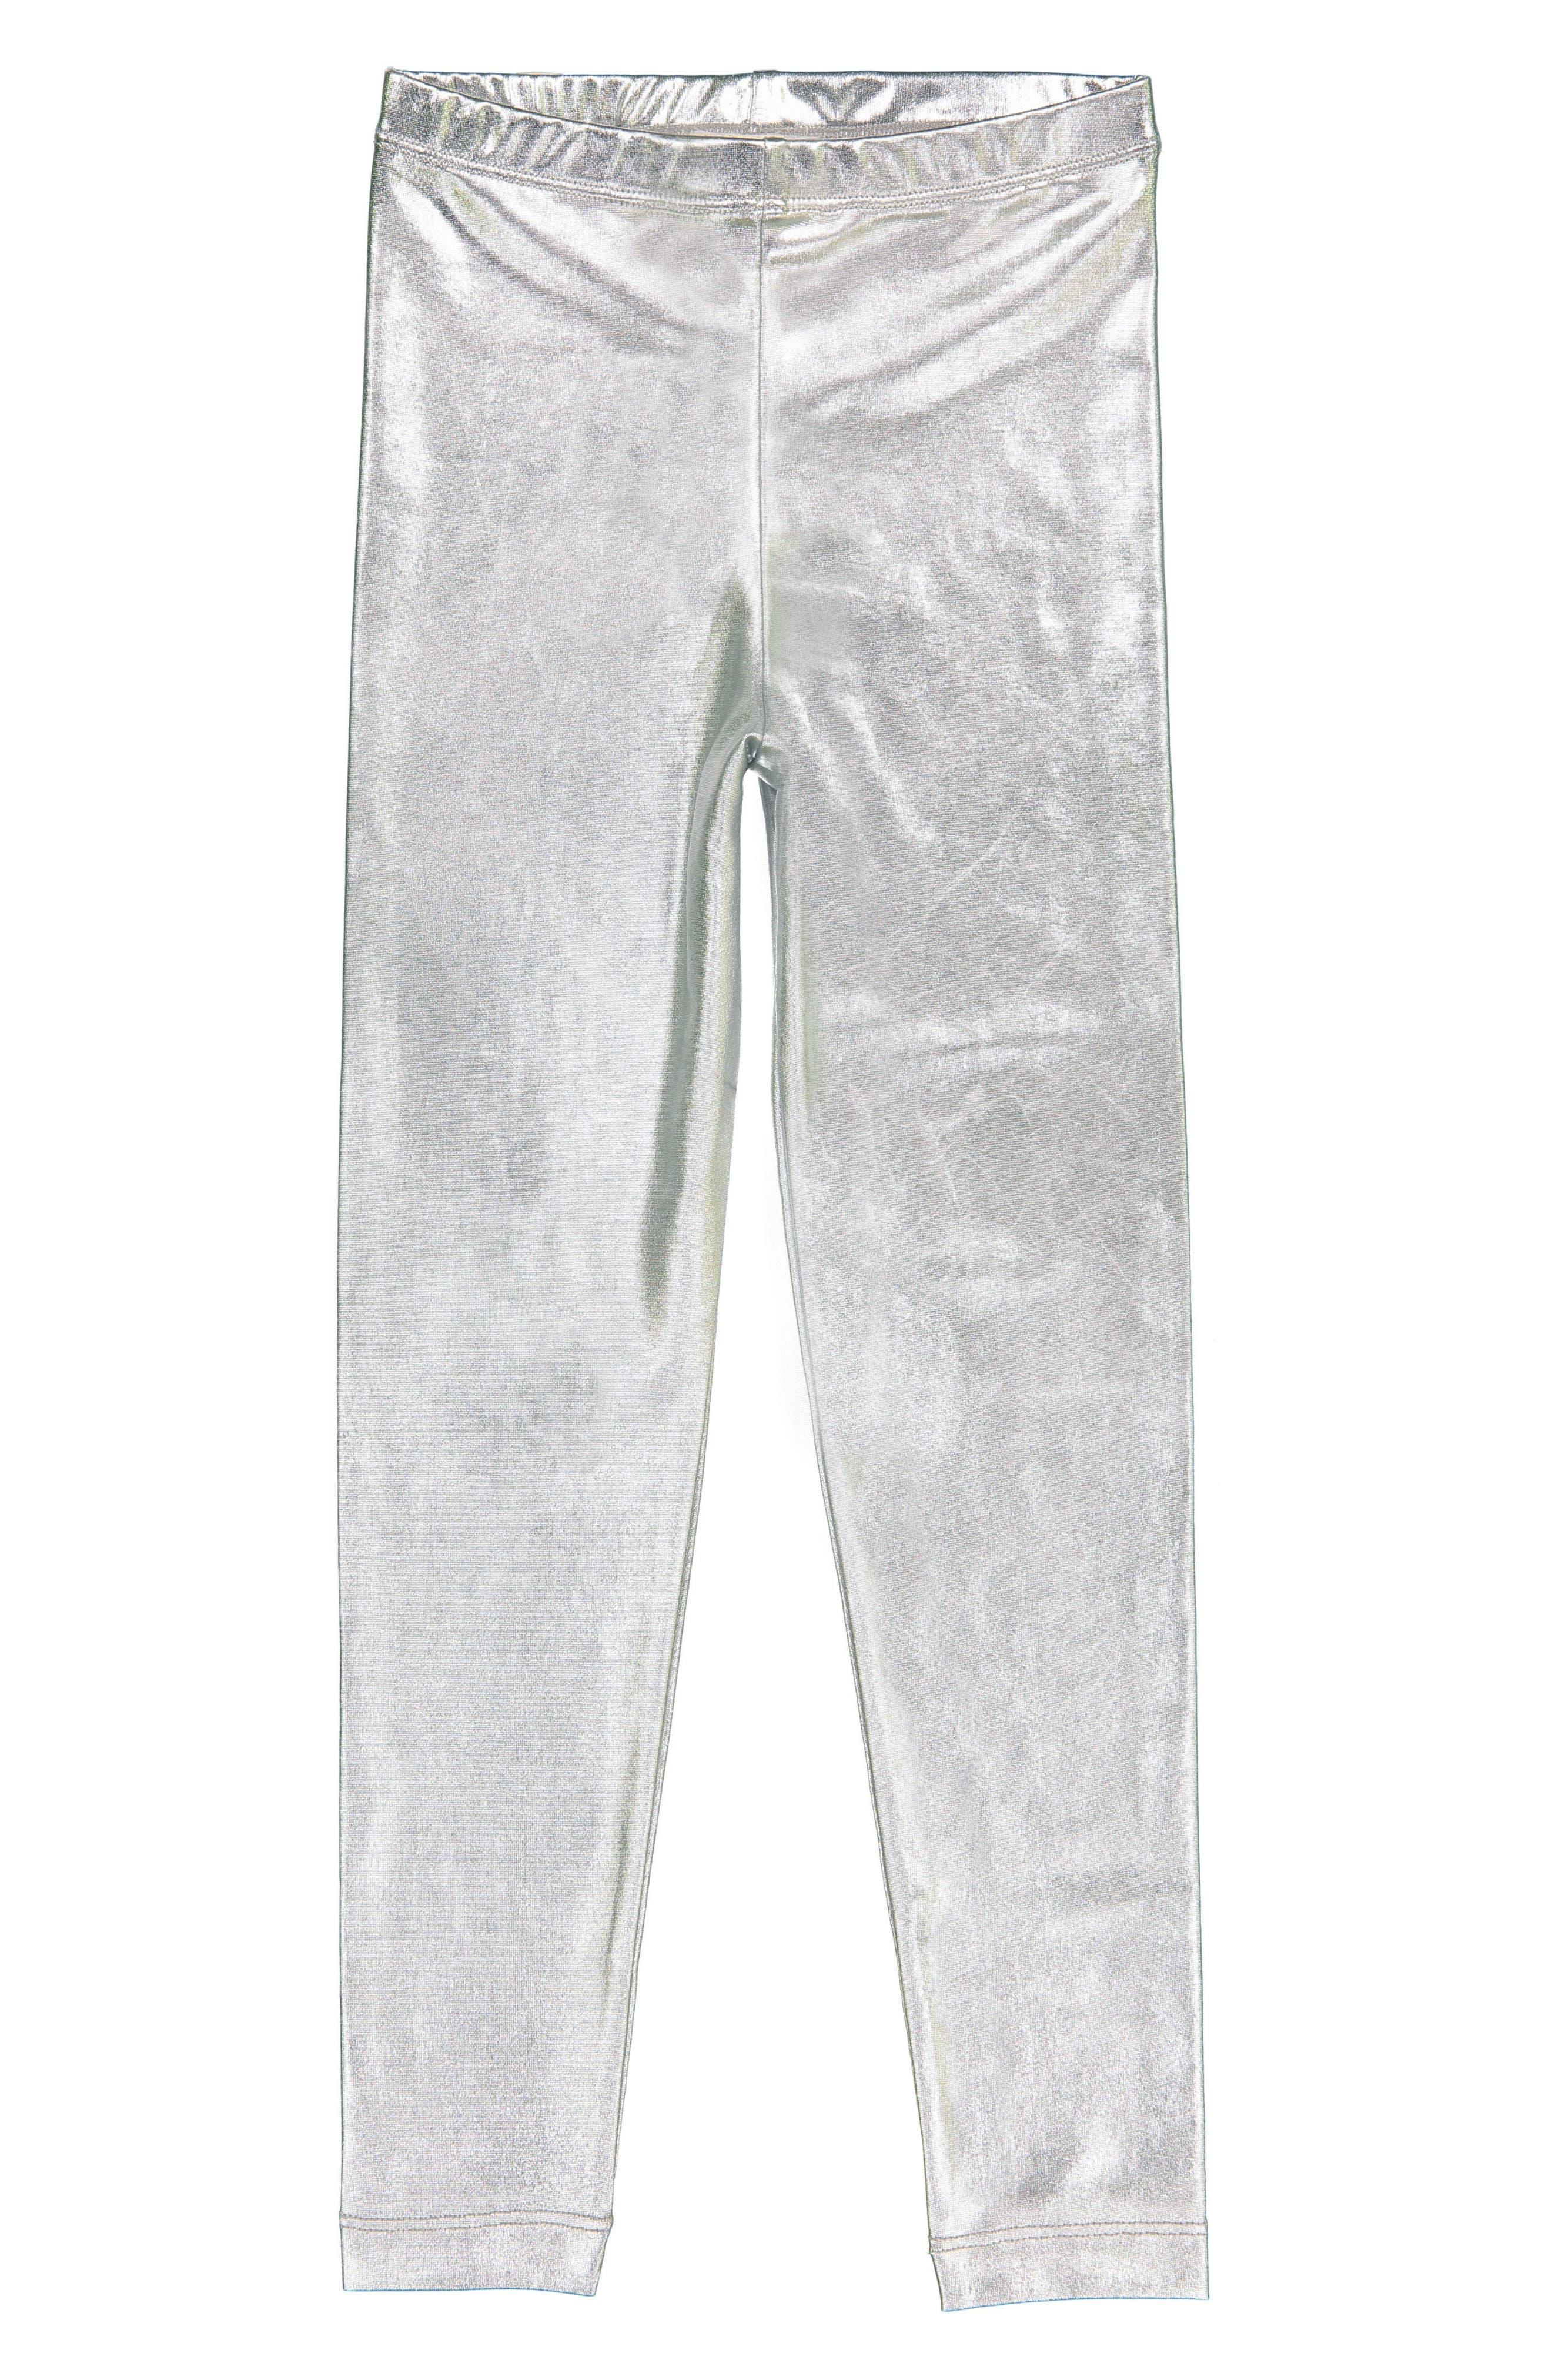 Girls Masala Baby Silver Metallic Leggings Size 8Y  Metallic